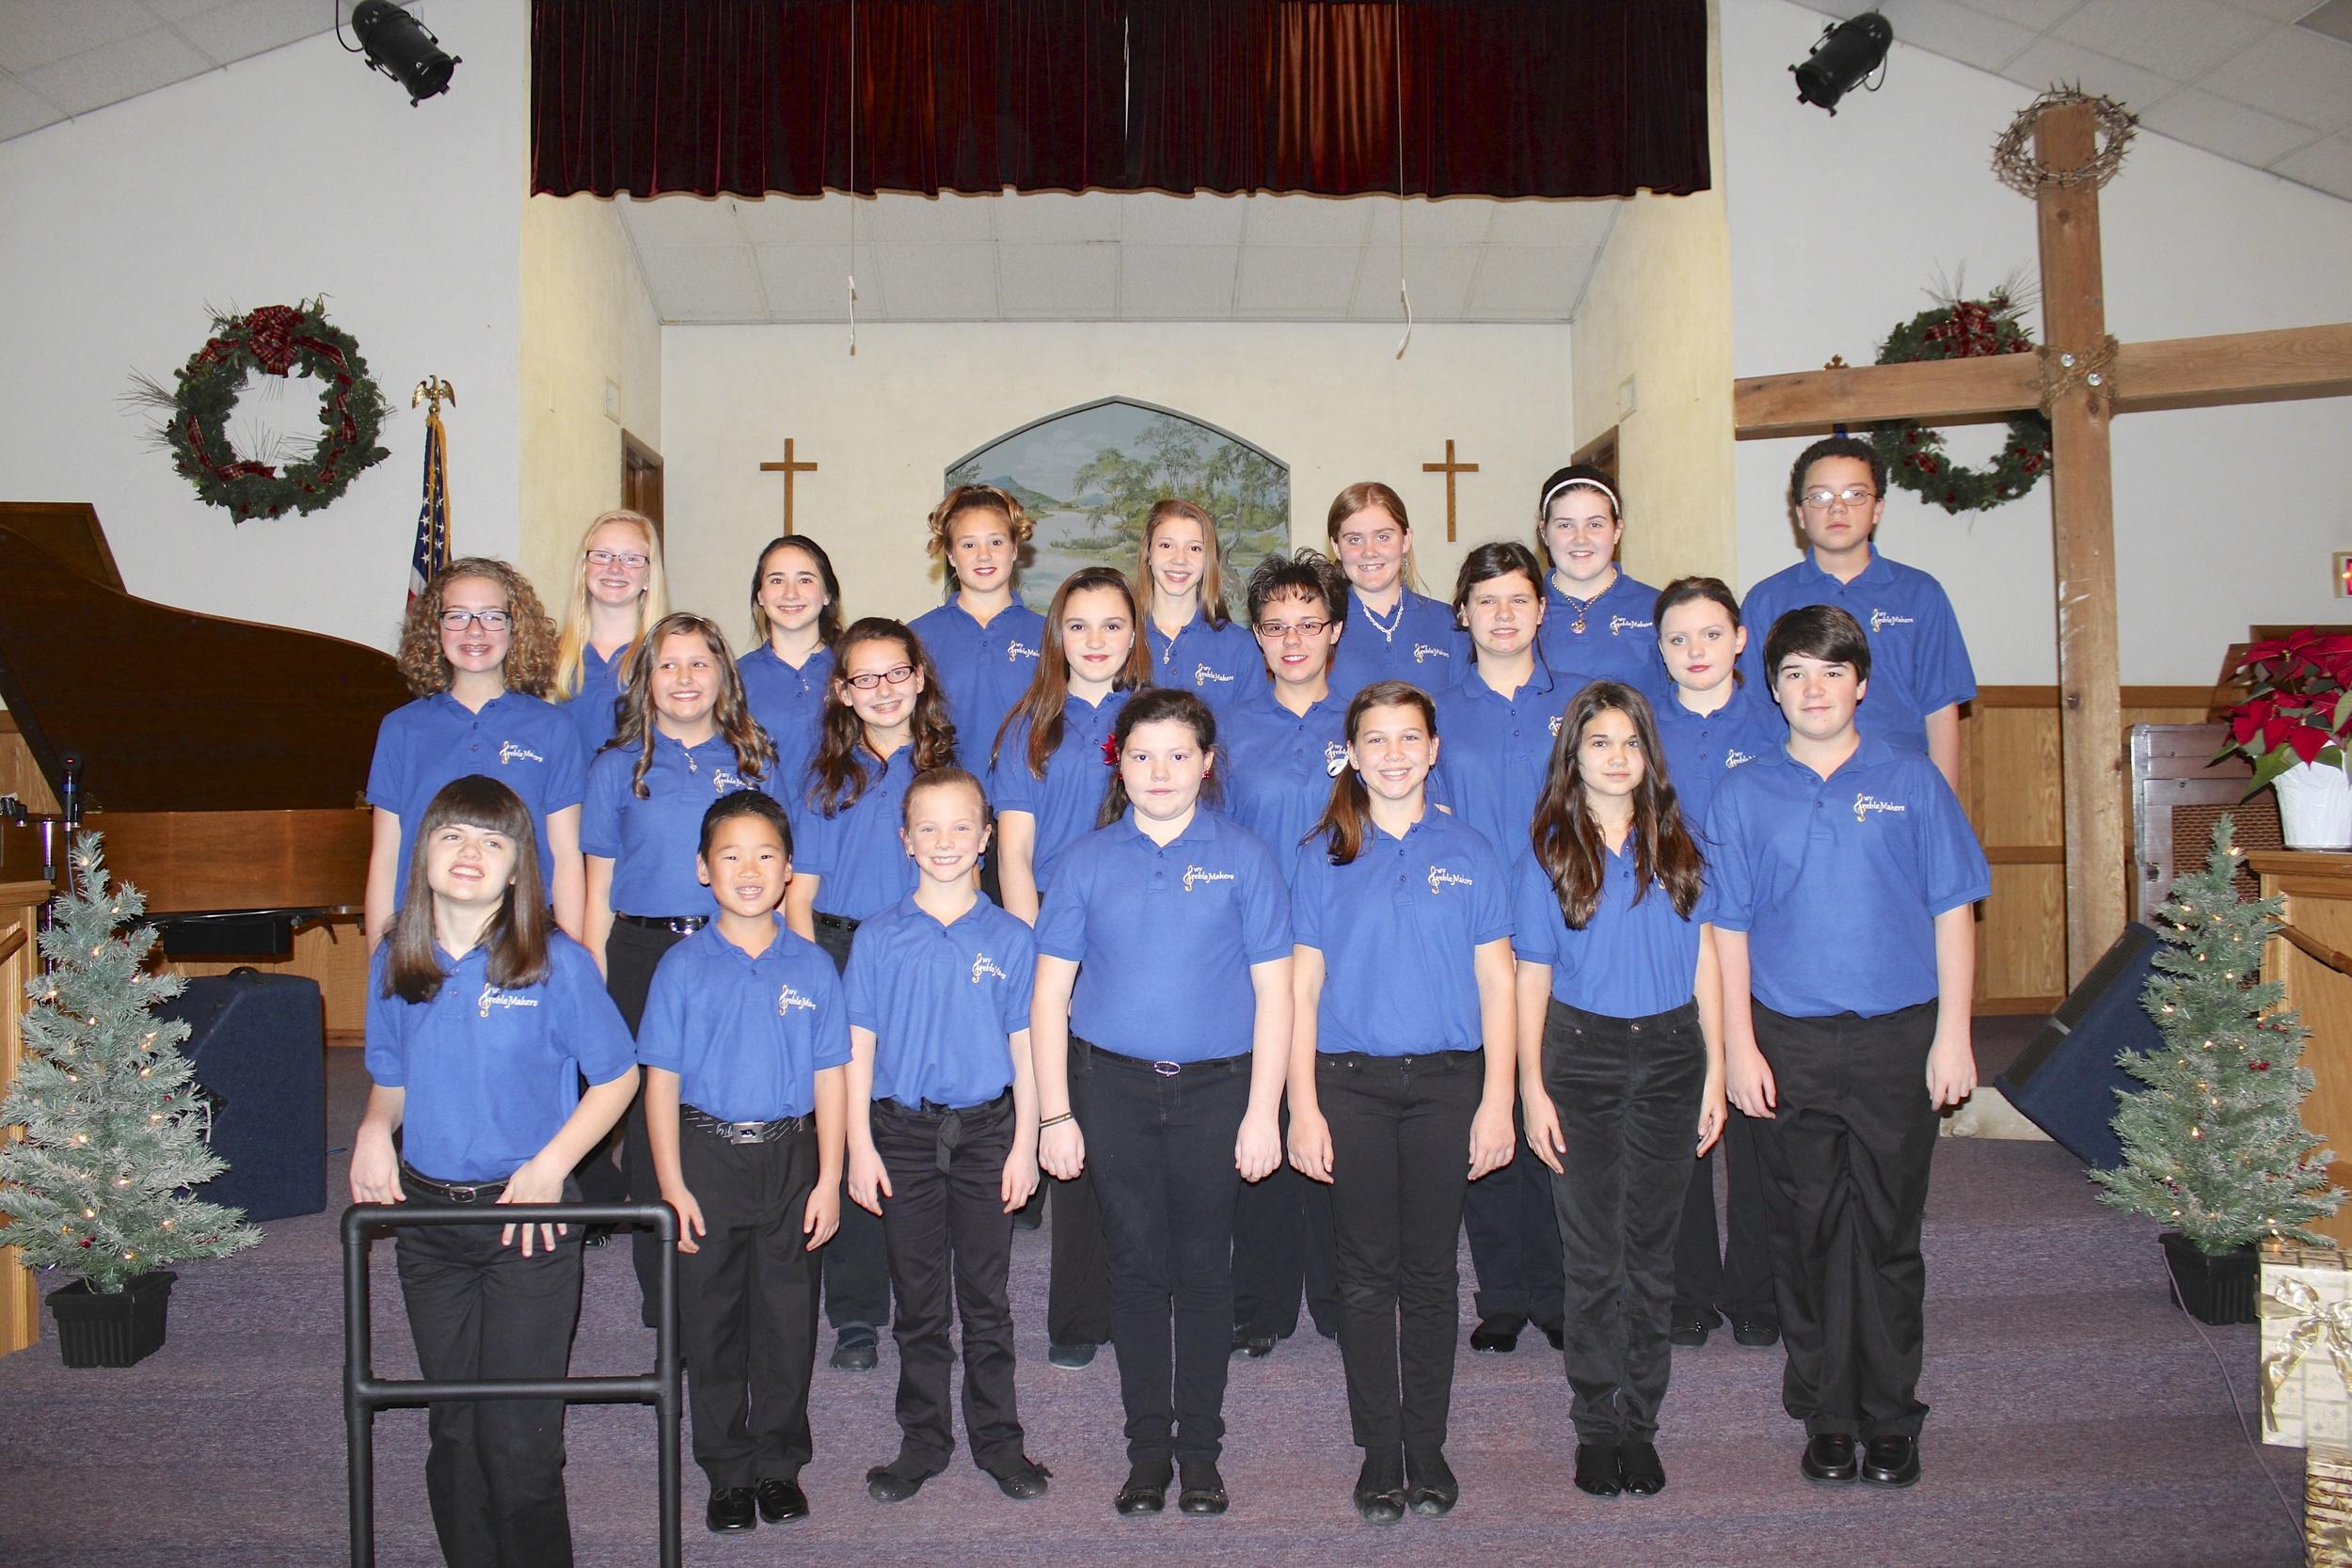 First Baptist Church, 12/15/13